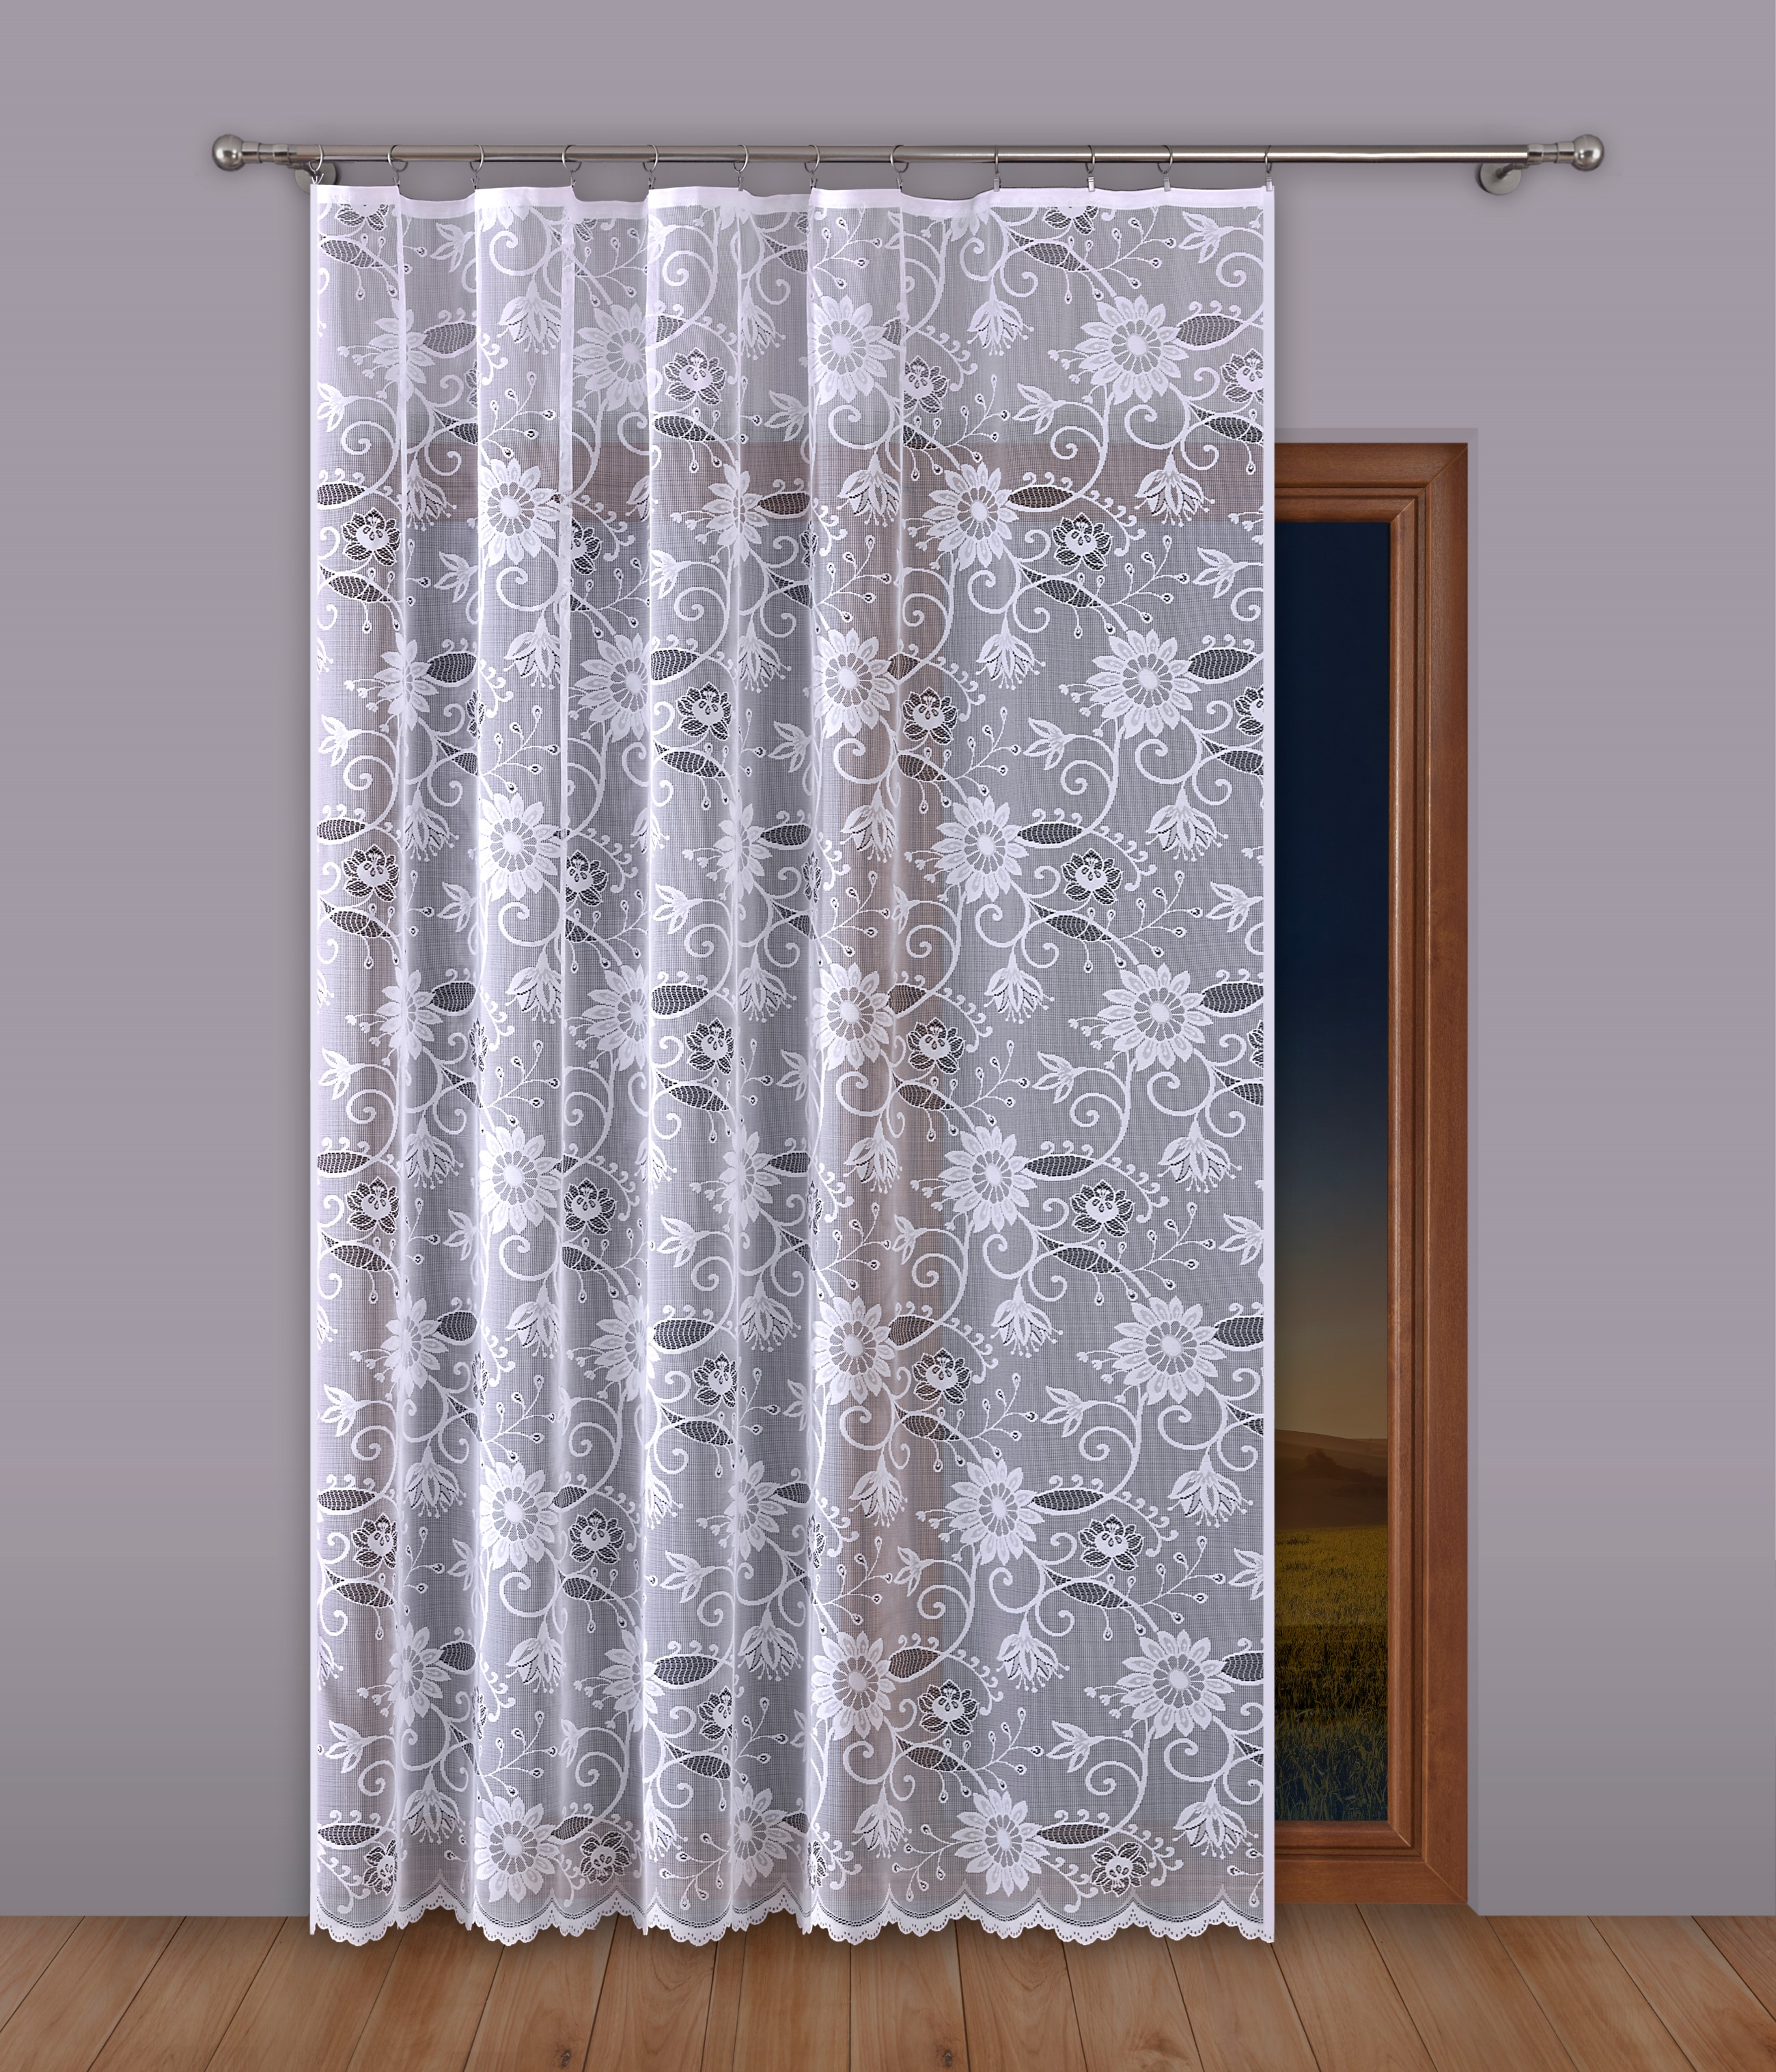 Шторы Primavera Классические шторы Beelzebub Цвет: Белый шторы kauffort классические шторы barolo